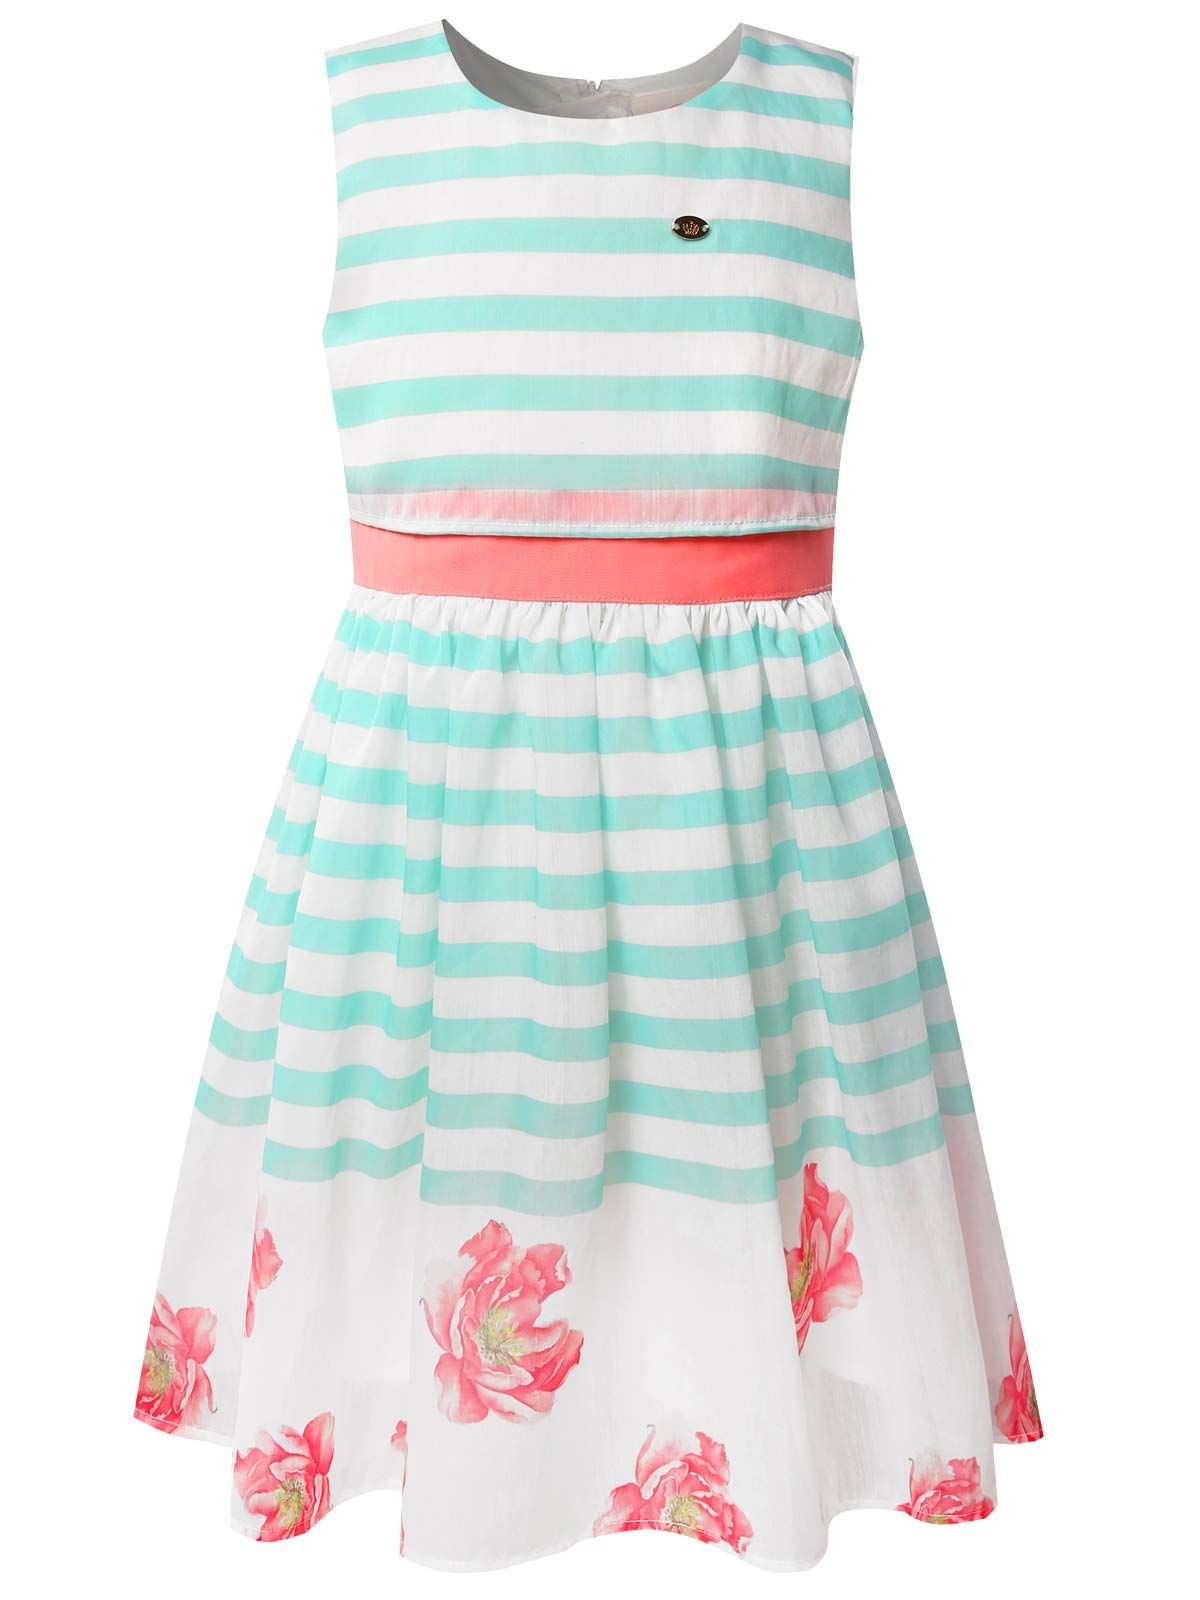 Bonny Billy Girls Summer Dress Elegant Pleated Clothes For Kids 3t 11t You Can Find More Details By Visiti Girls Dresses Summer Girly Dresses Summer Dresses [ 1600 x 1200 Pixel ]